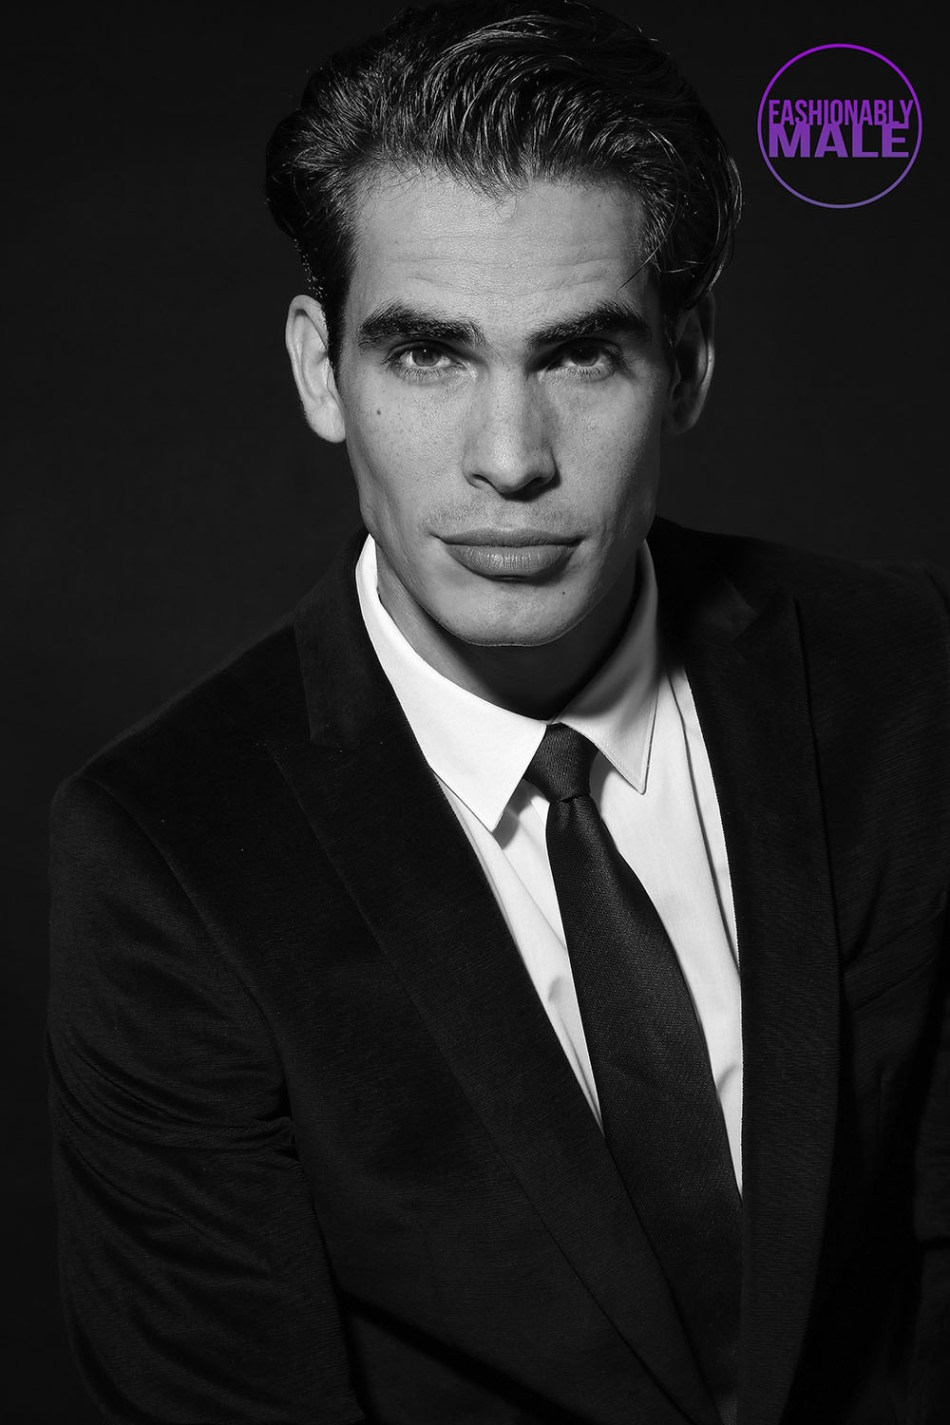 Felipe Villagrana by Afif Kattan for Fashionably Male1